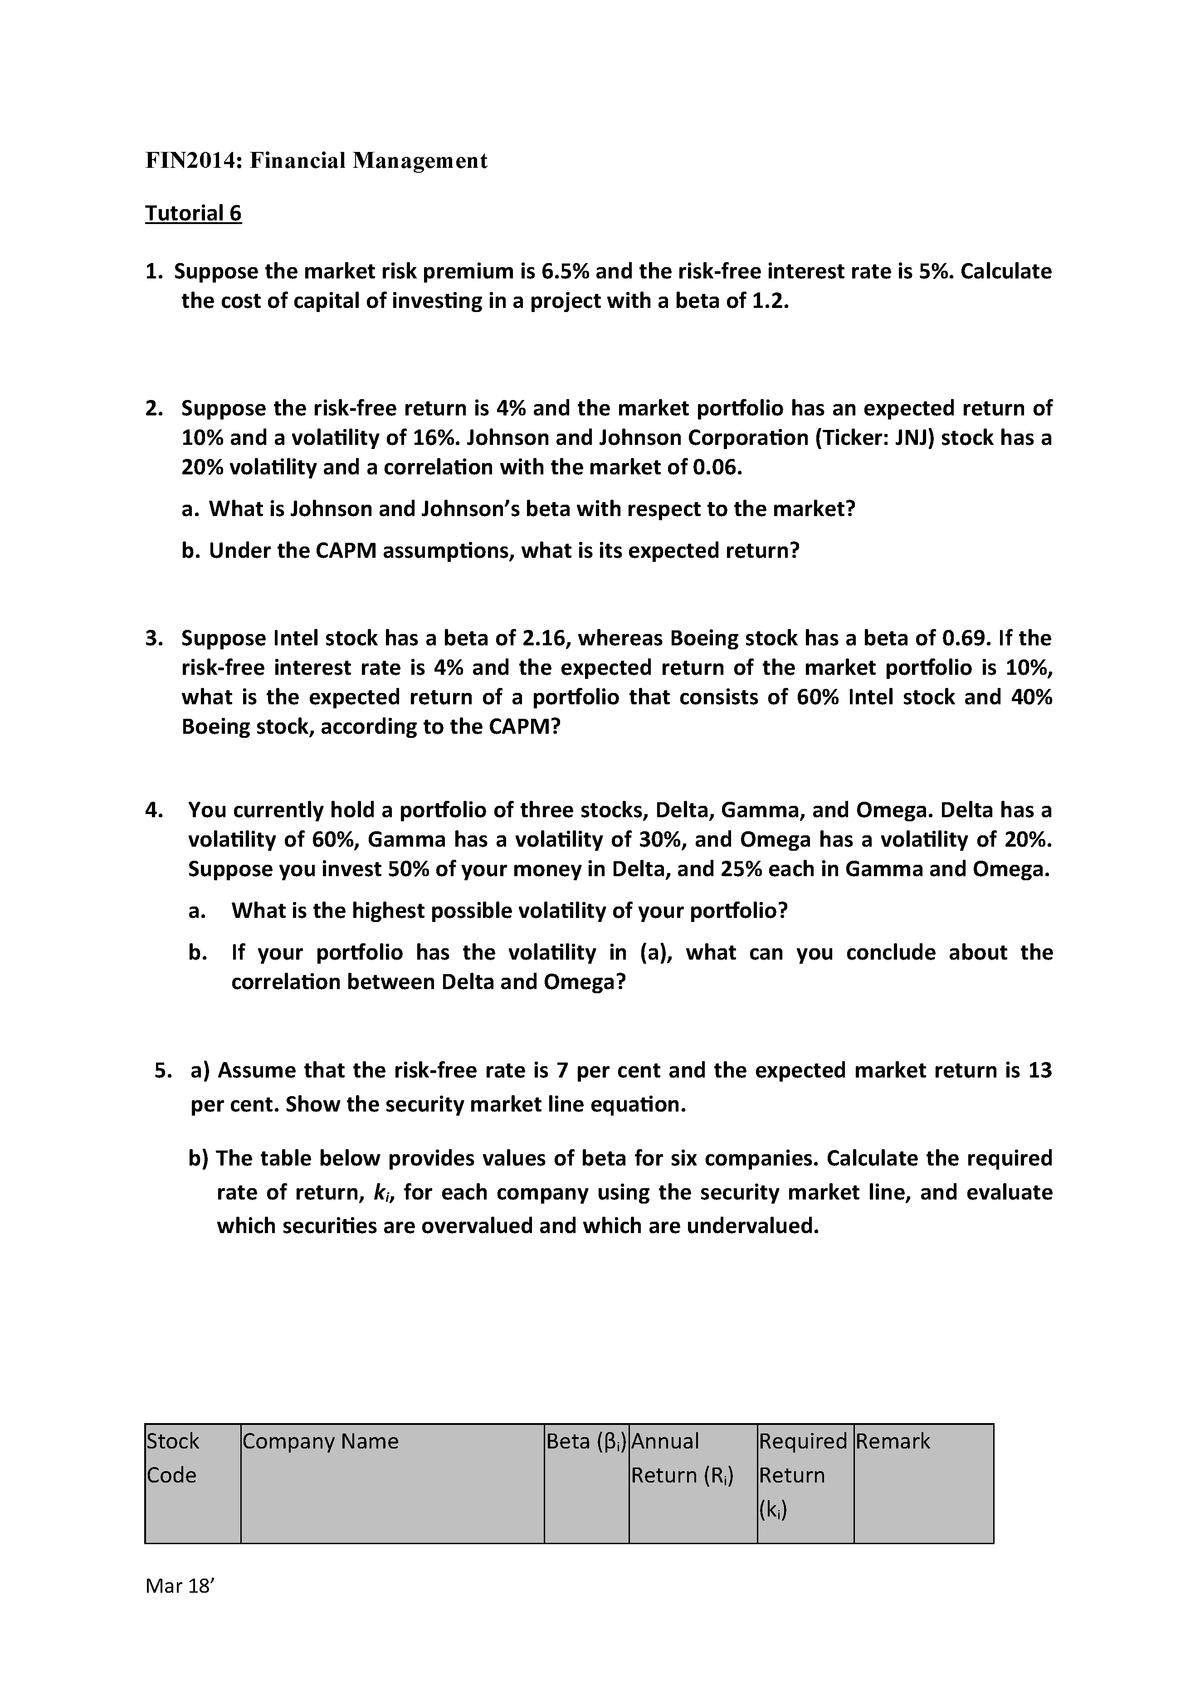 Tutorial 6n-Qns - BSc(Hons) FInancial Analysis BFA1608 - StuDocu